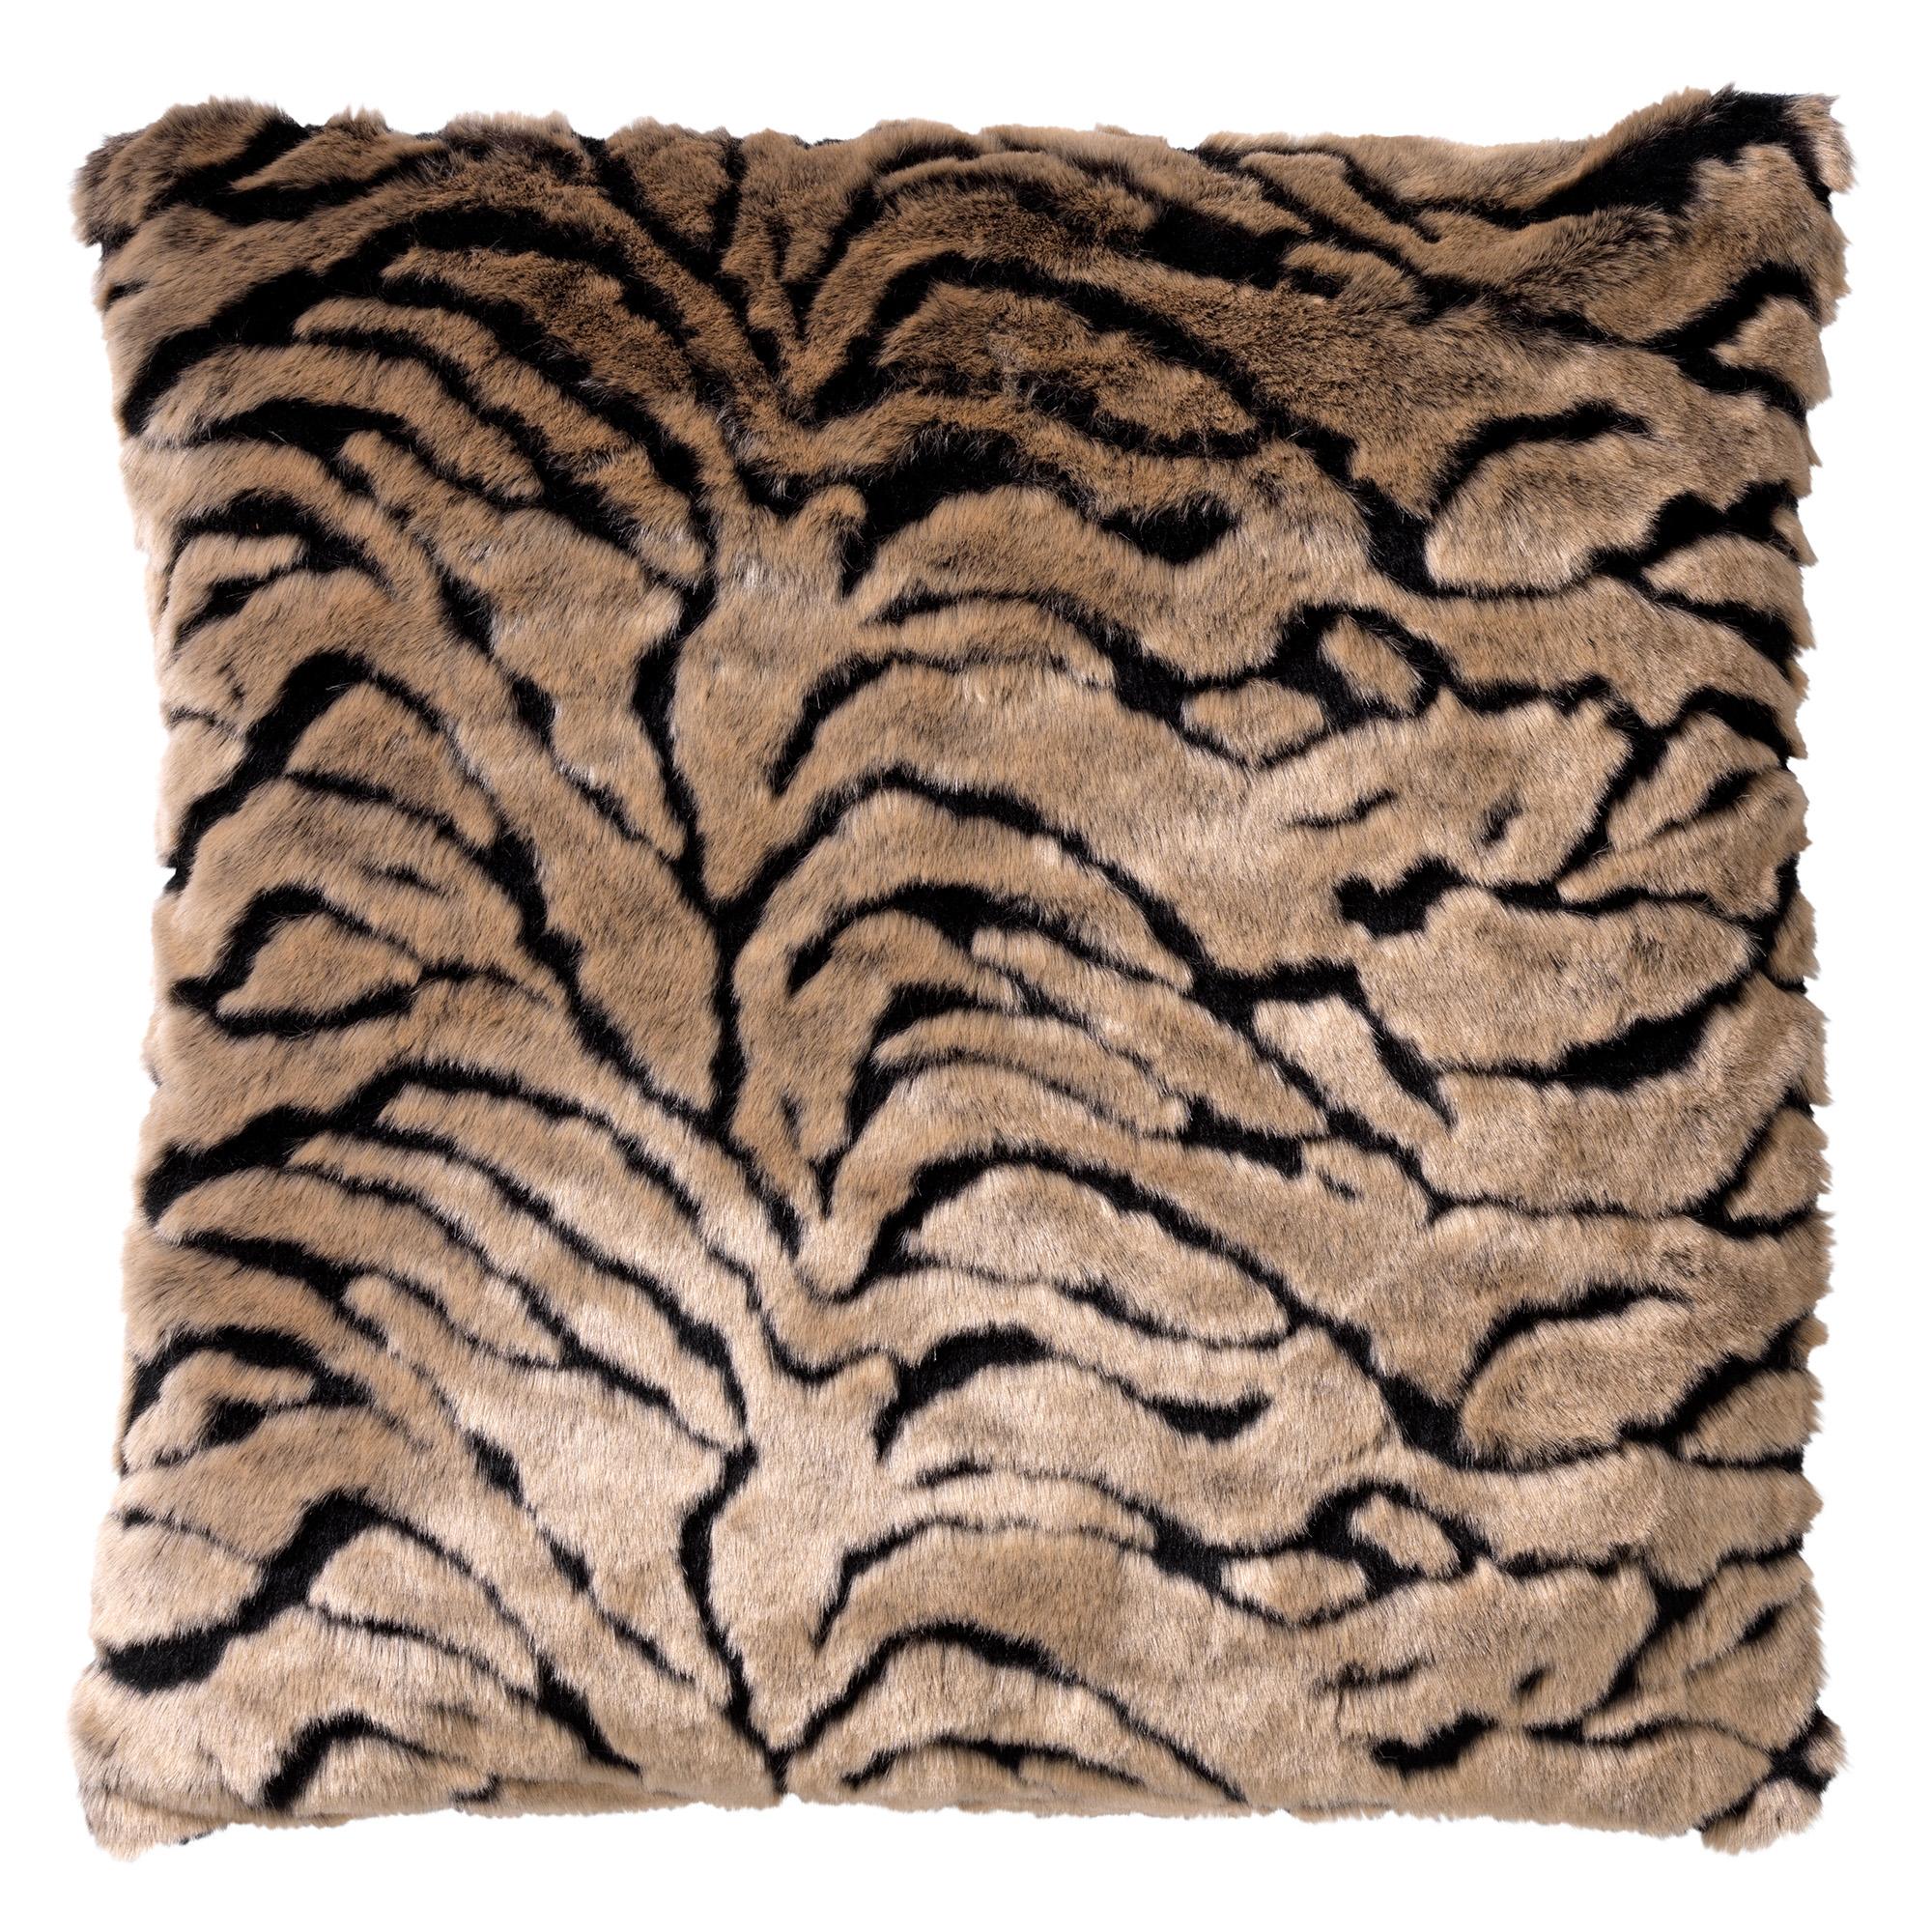 KENZO - Kussenhoes met dierenprint 45x45 cm Rocky Road